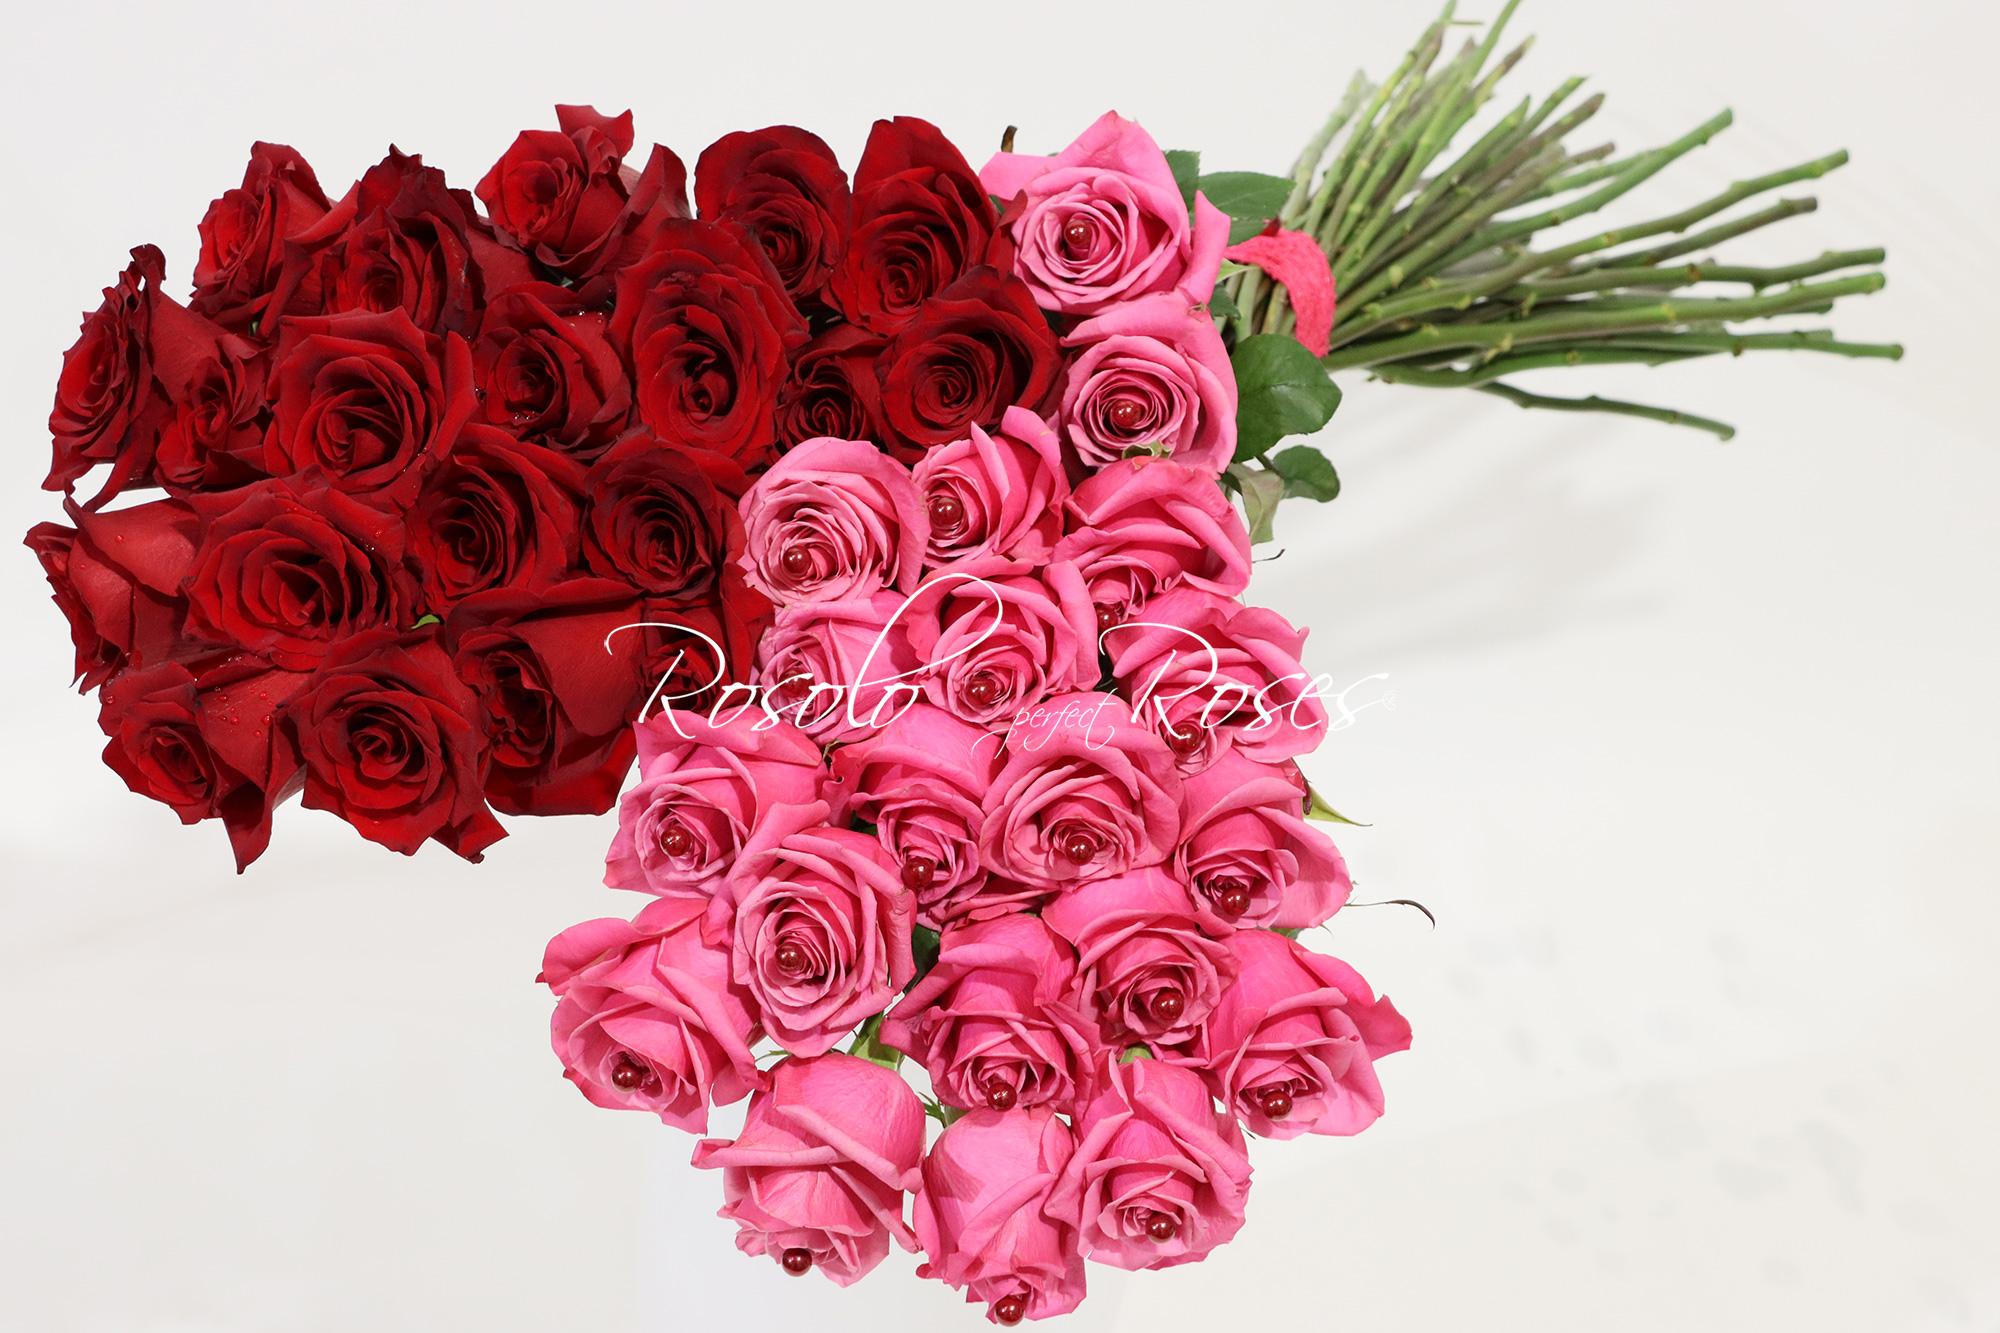 40 grandes roses CHF 395.00 - livraison rapide